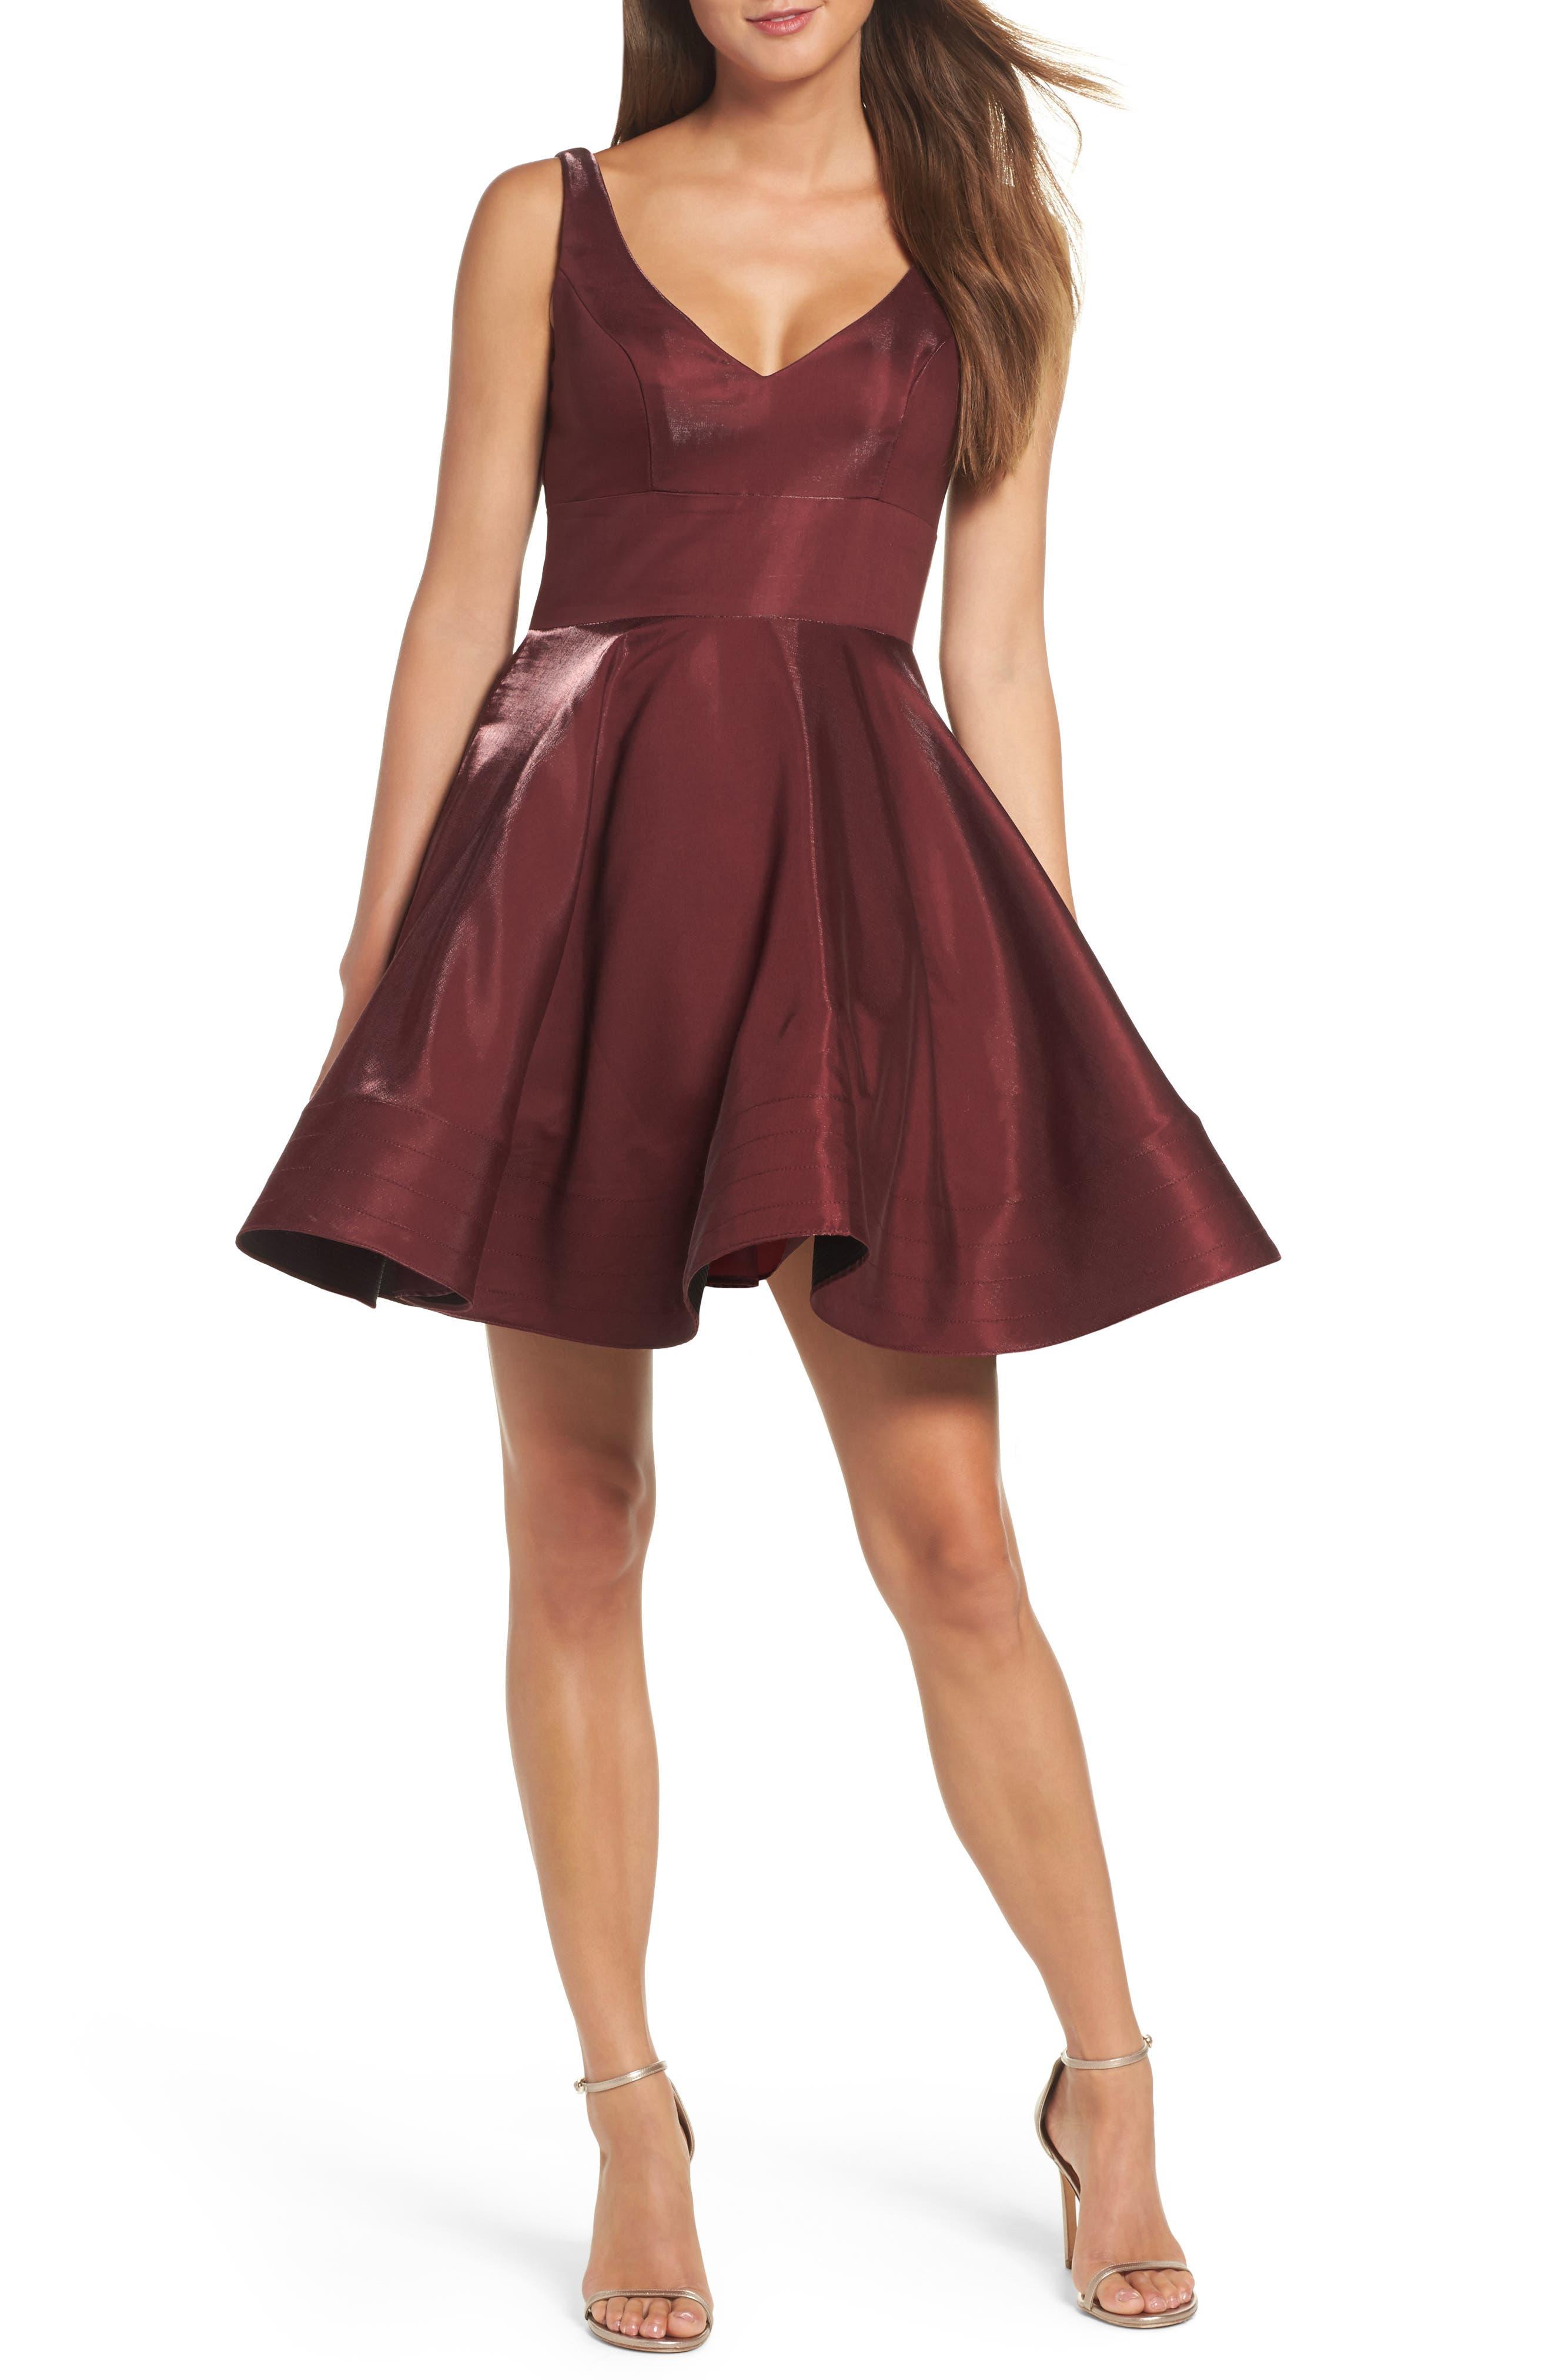 Alternate Image 1 Selected - Xscape Shimmer Fit & Flare Dress